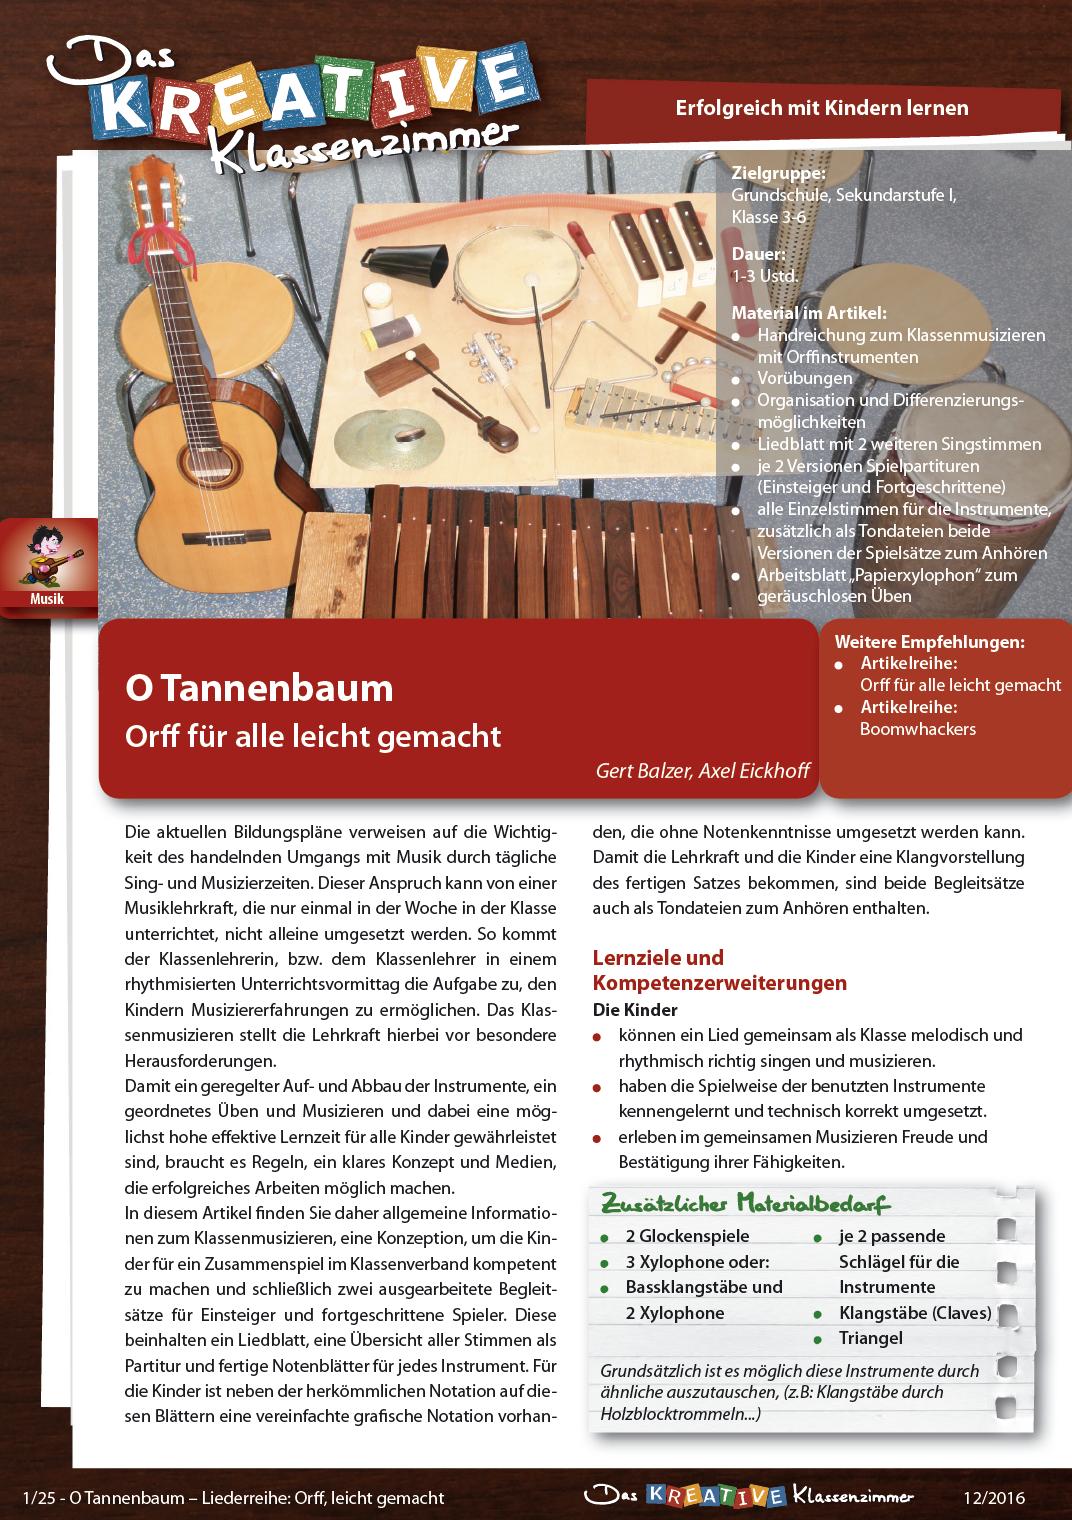 O Tannenbaum - Orff